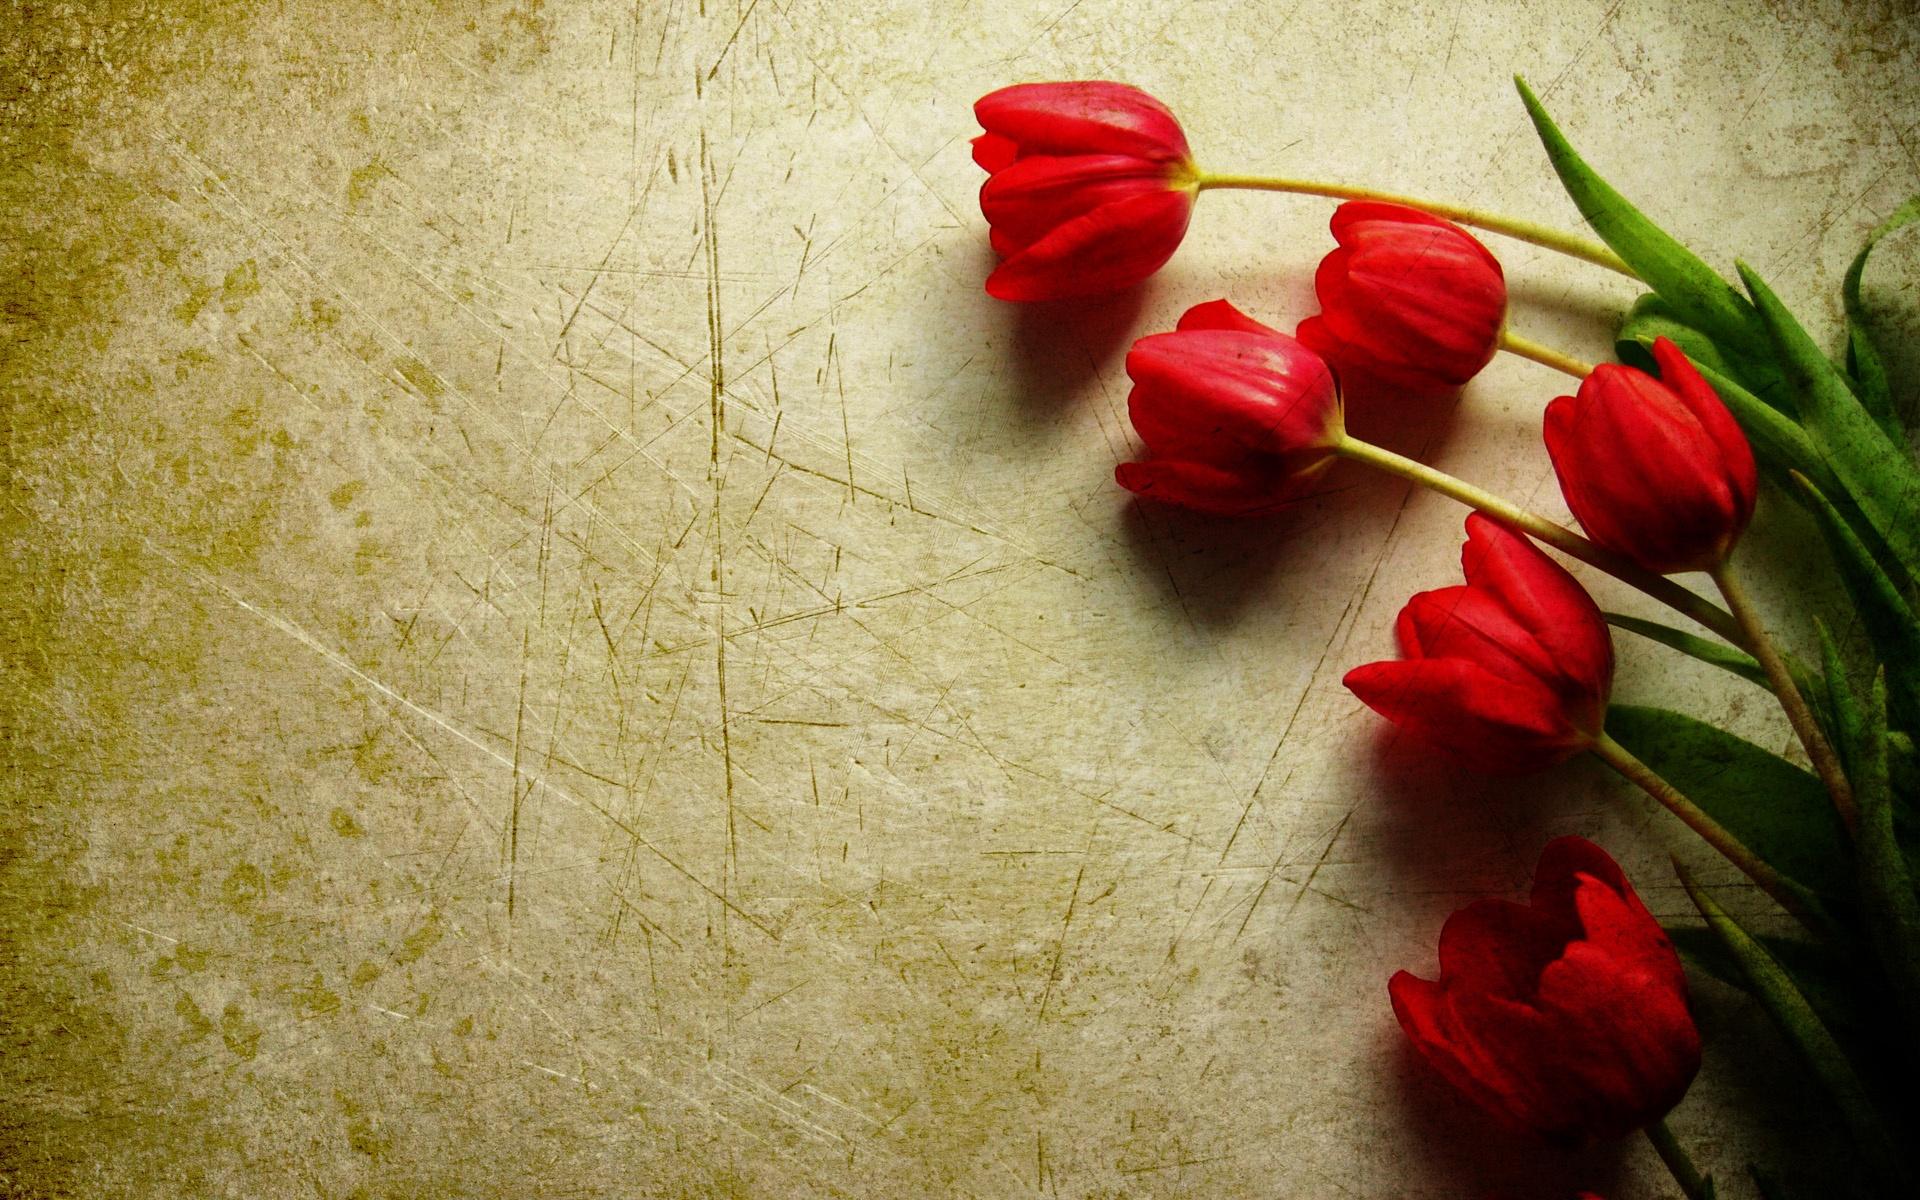 Grunge red tulips